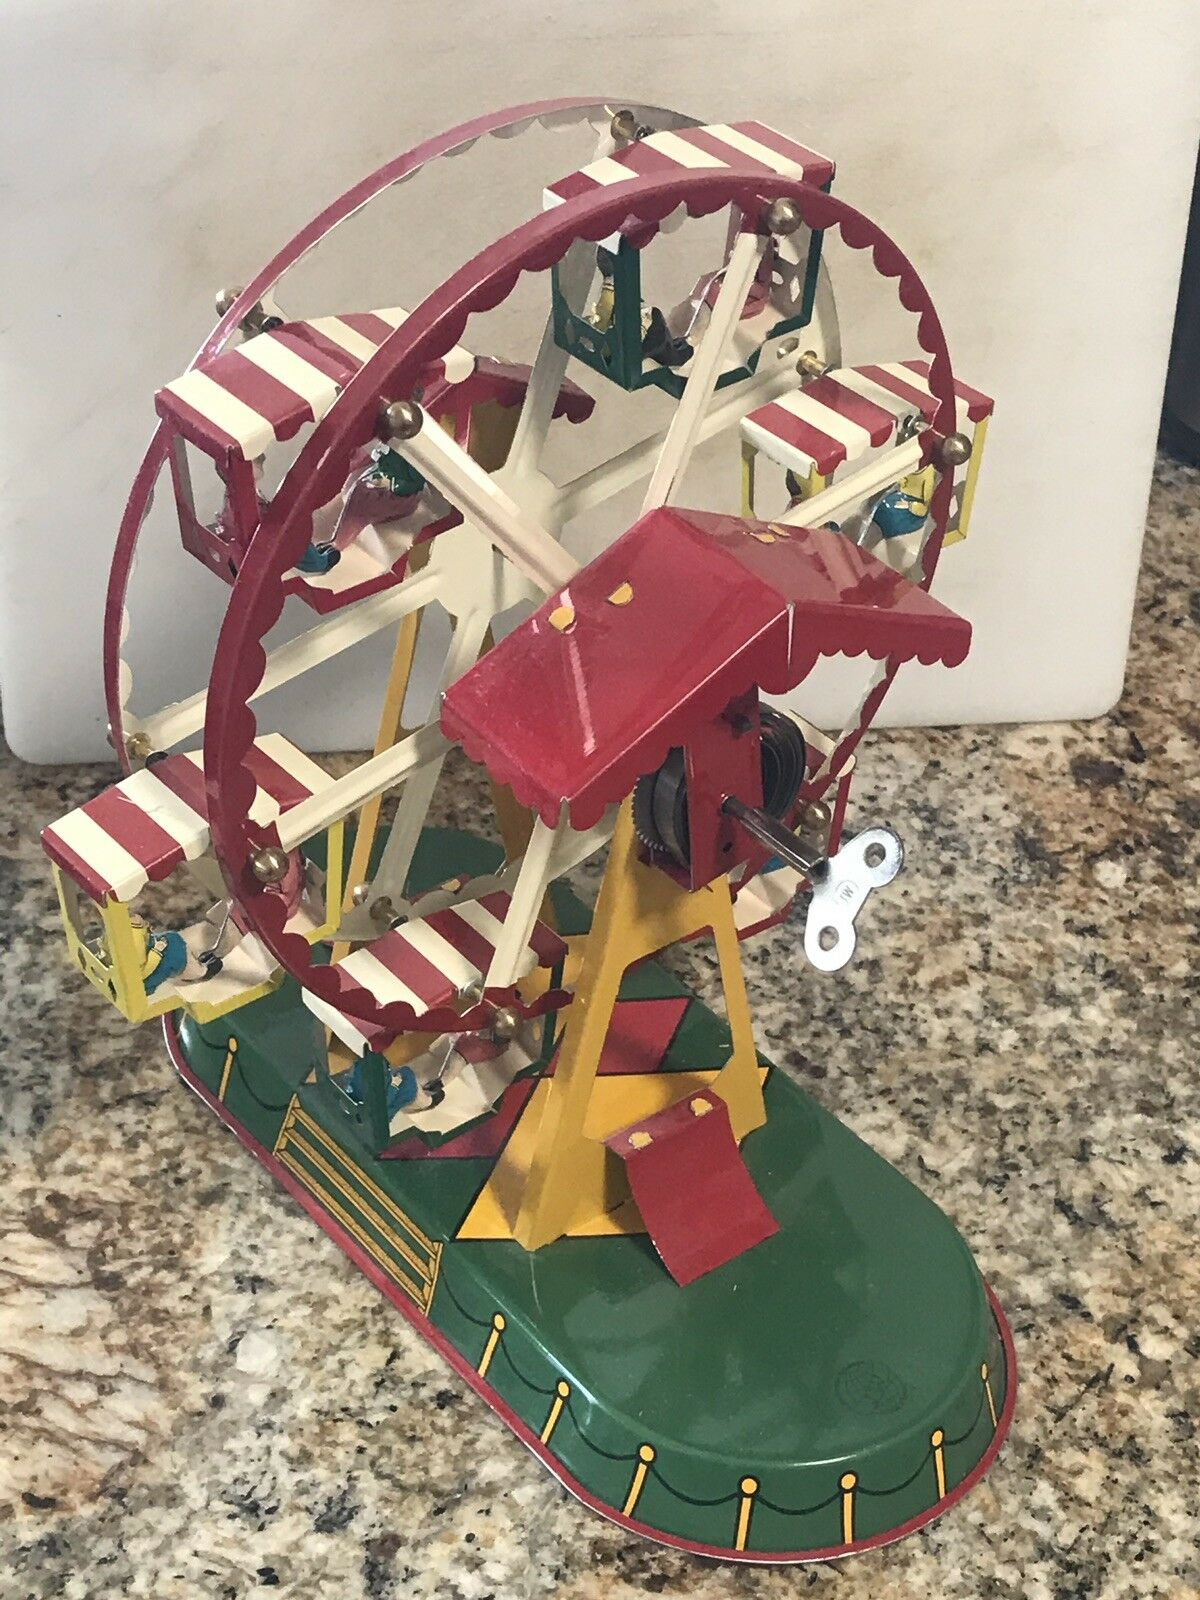 Wagner/Brunn Tin Ferris Wheel Toy Carousel With Windup Key & Original Box